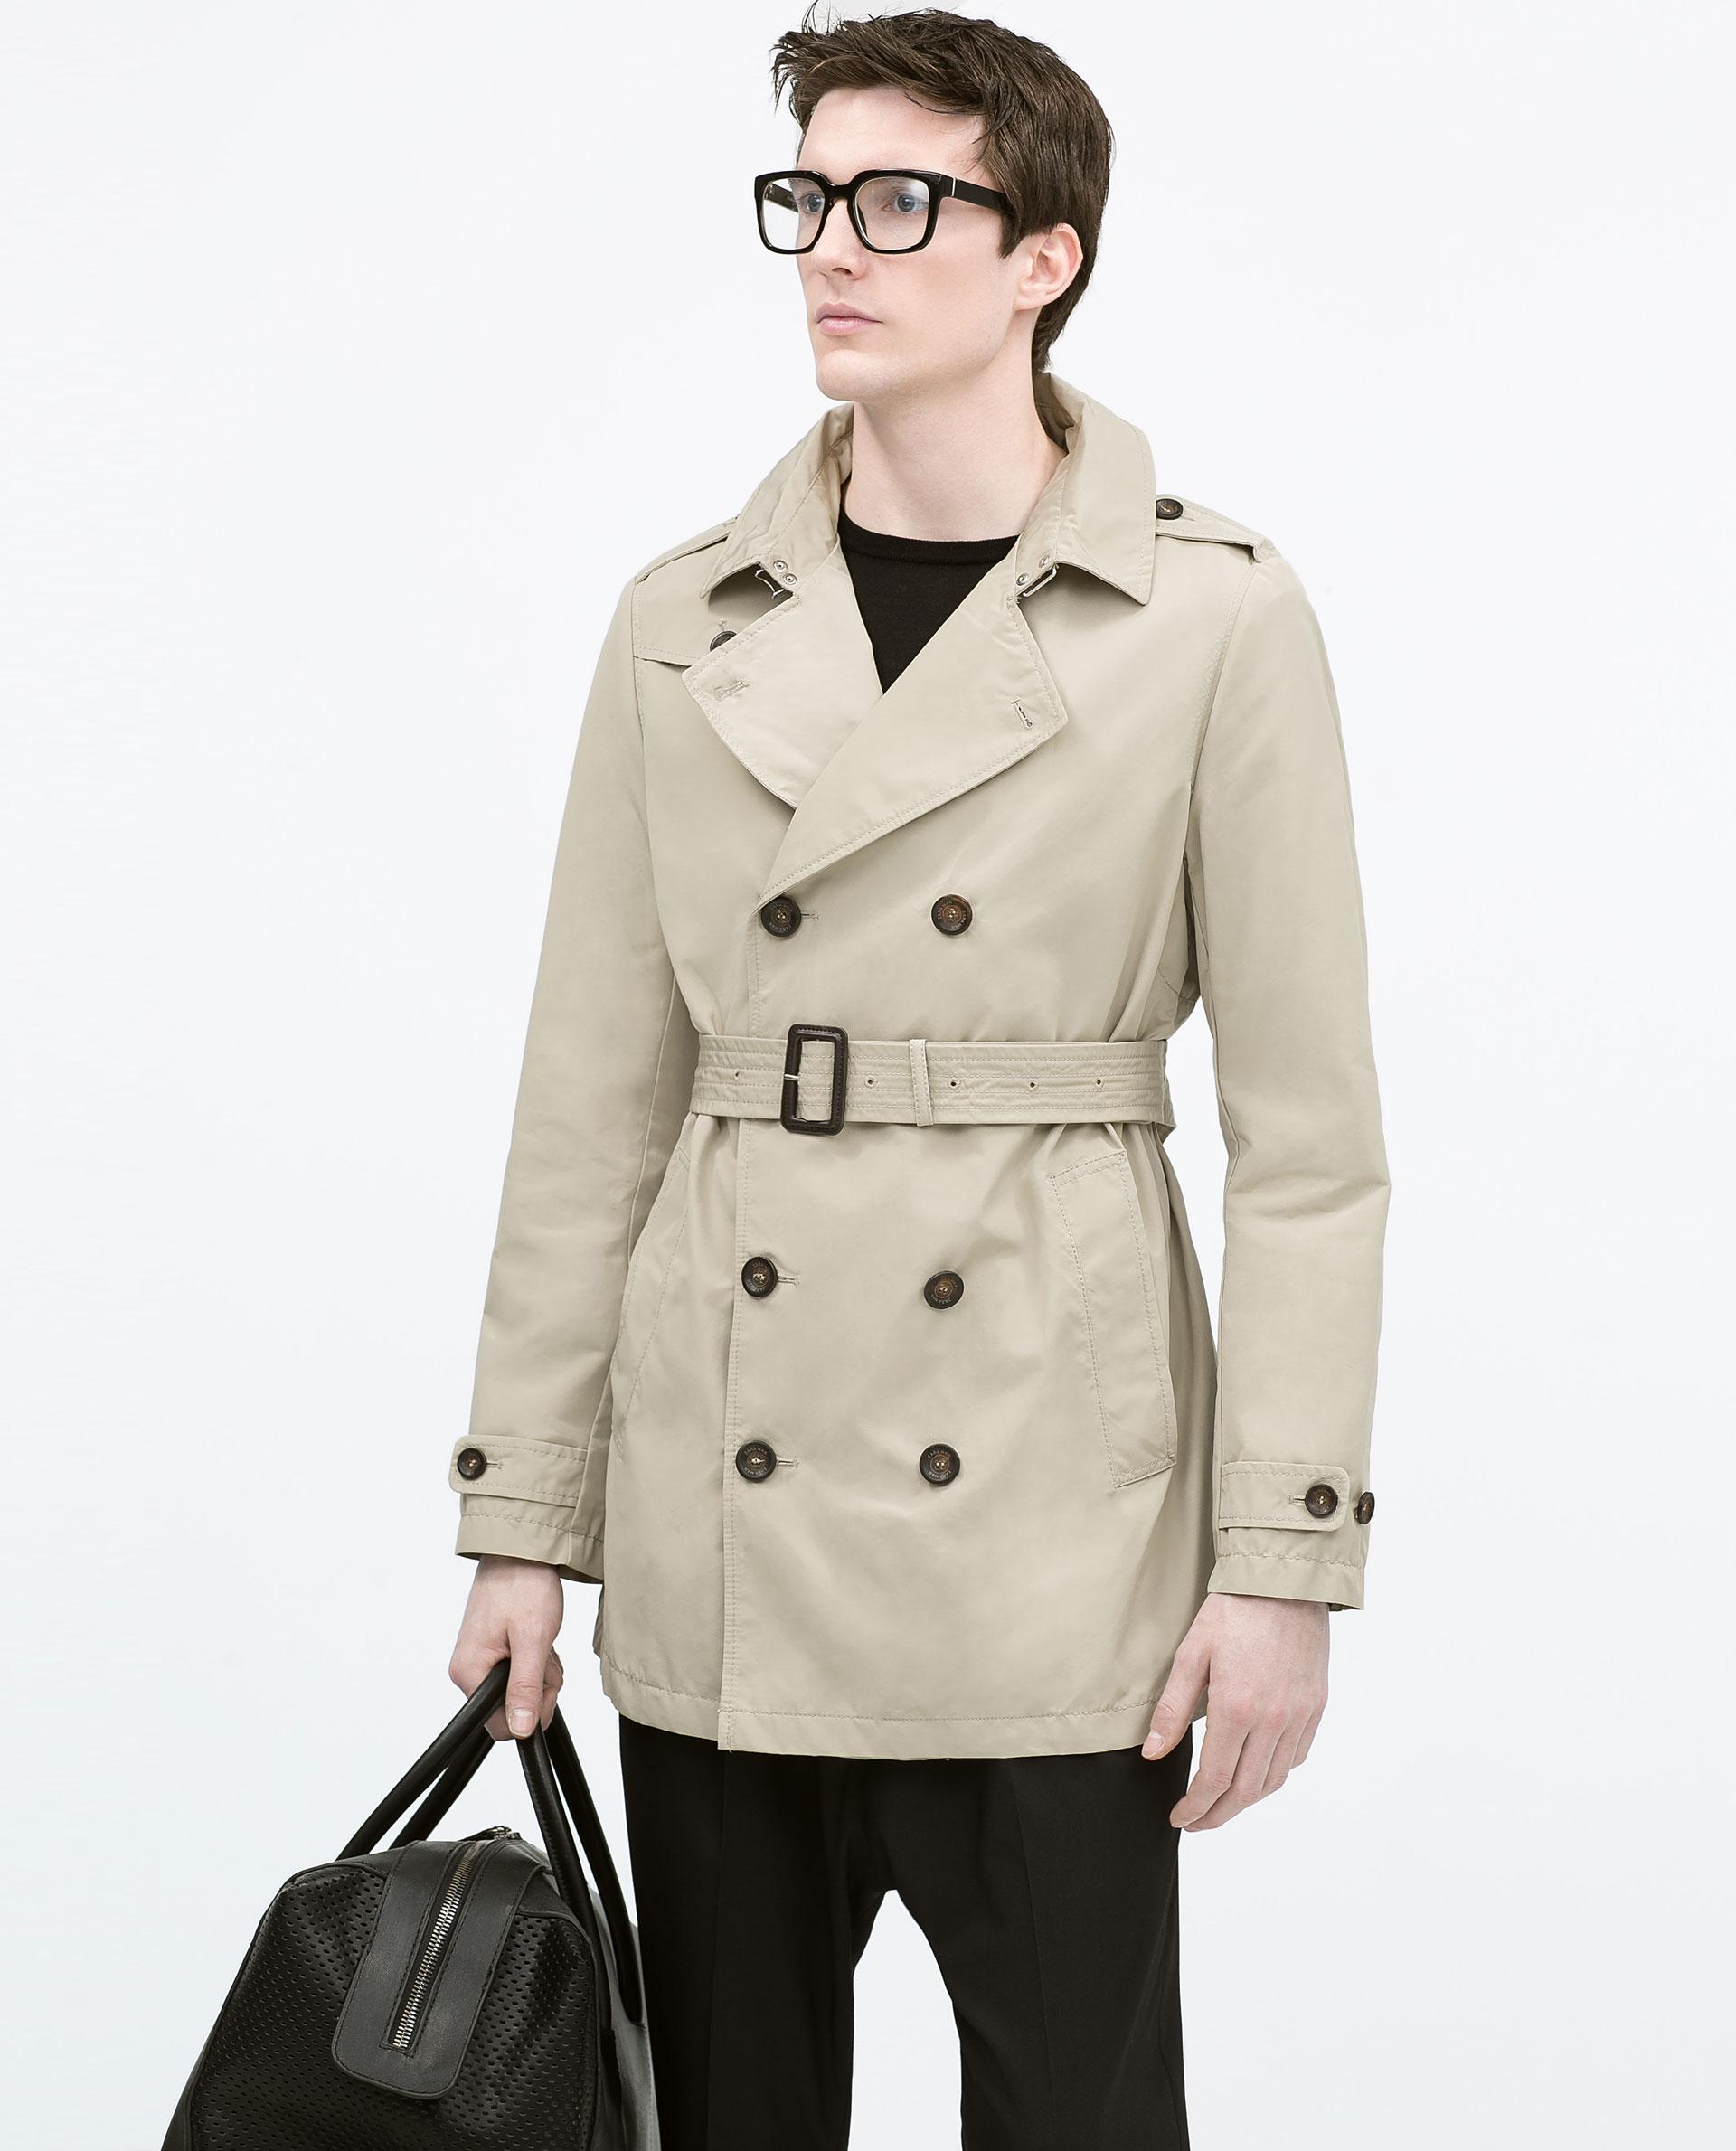 c52c1f56 Allsaints Us Women S Leather Jackets Now. Zara Women Faux Suede Trench Coat  4968 221 Us45384 ...